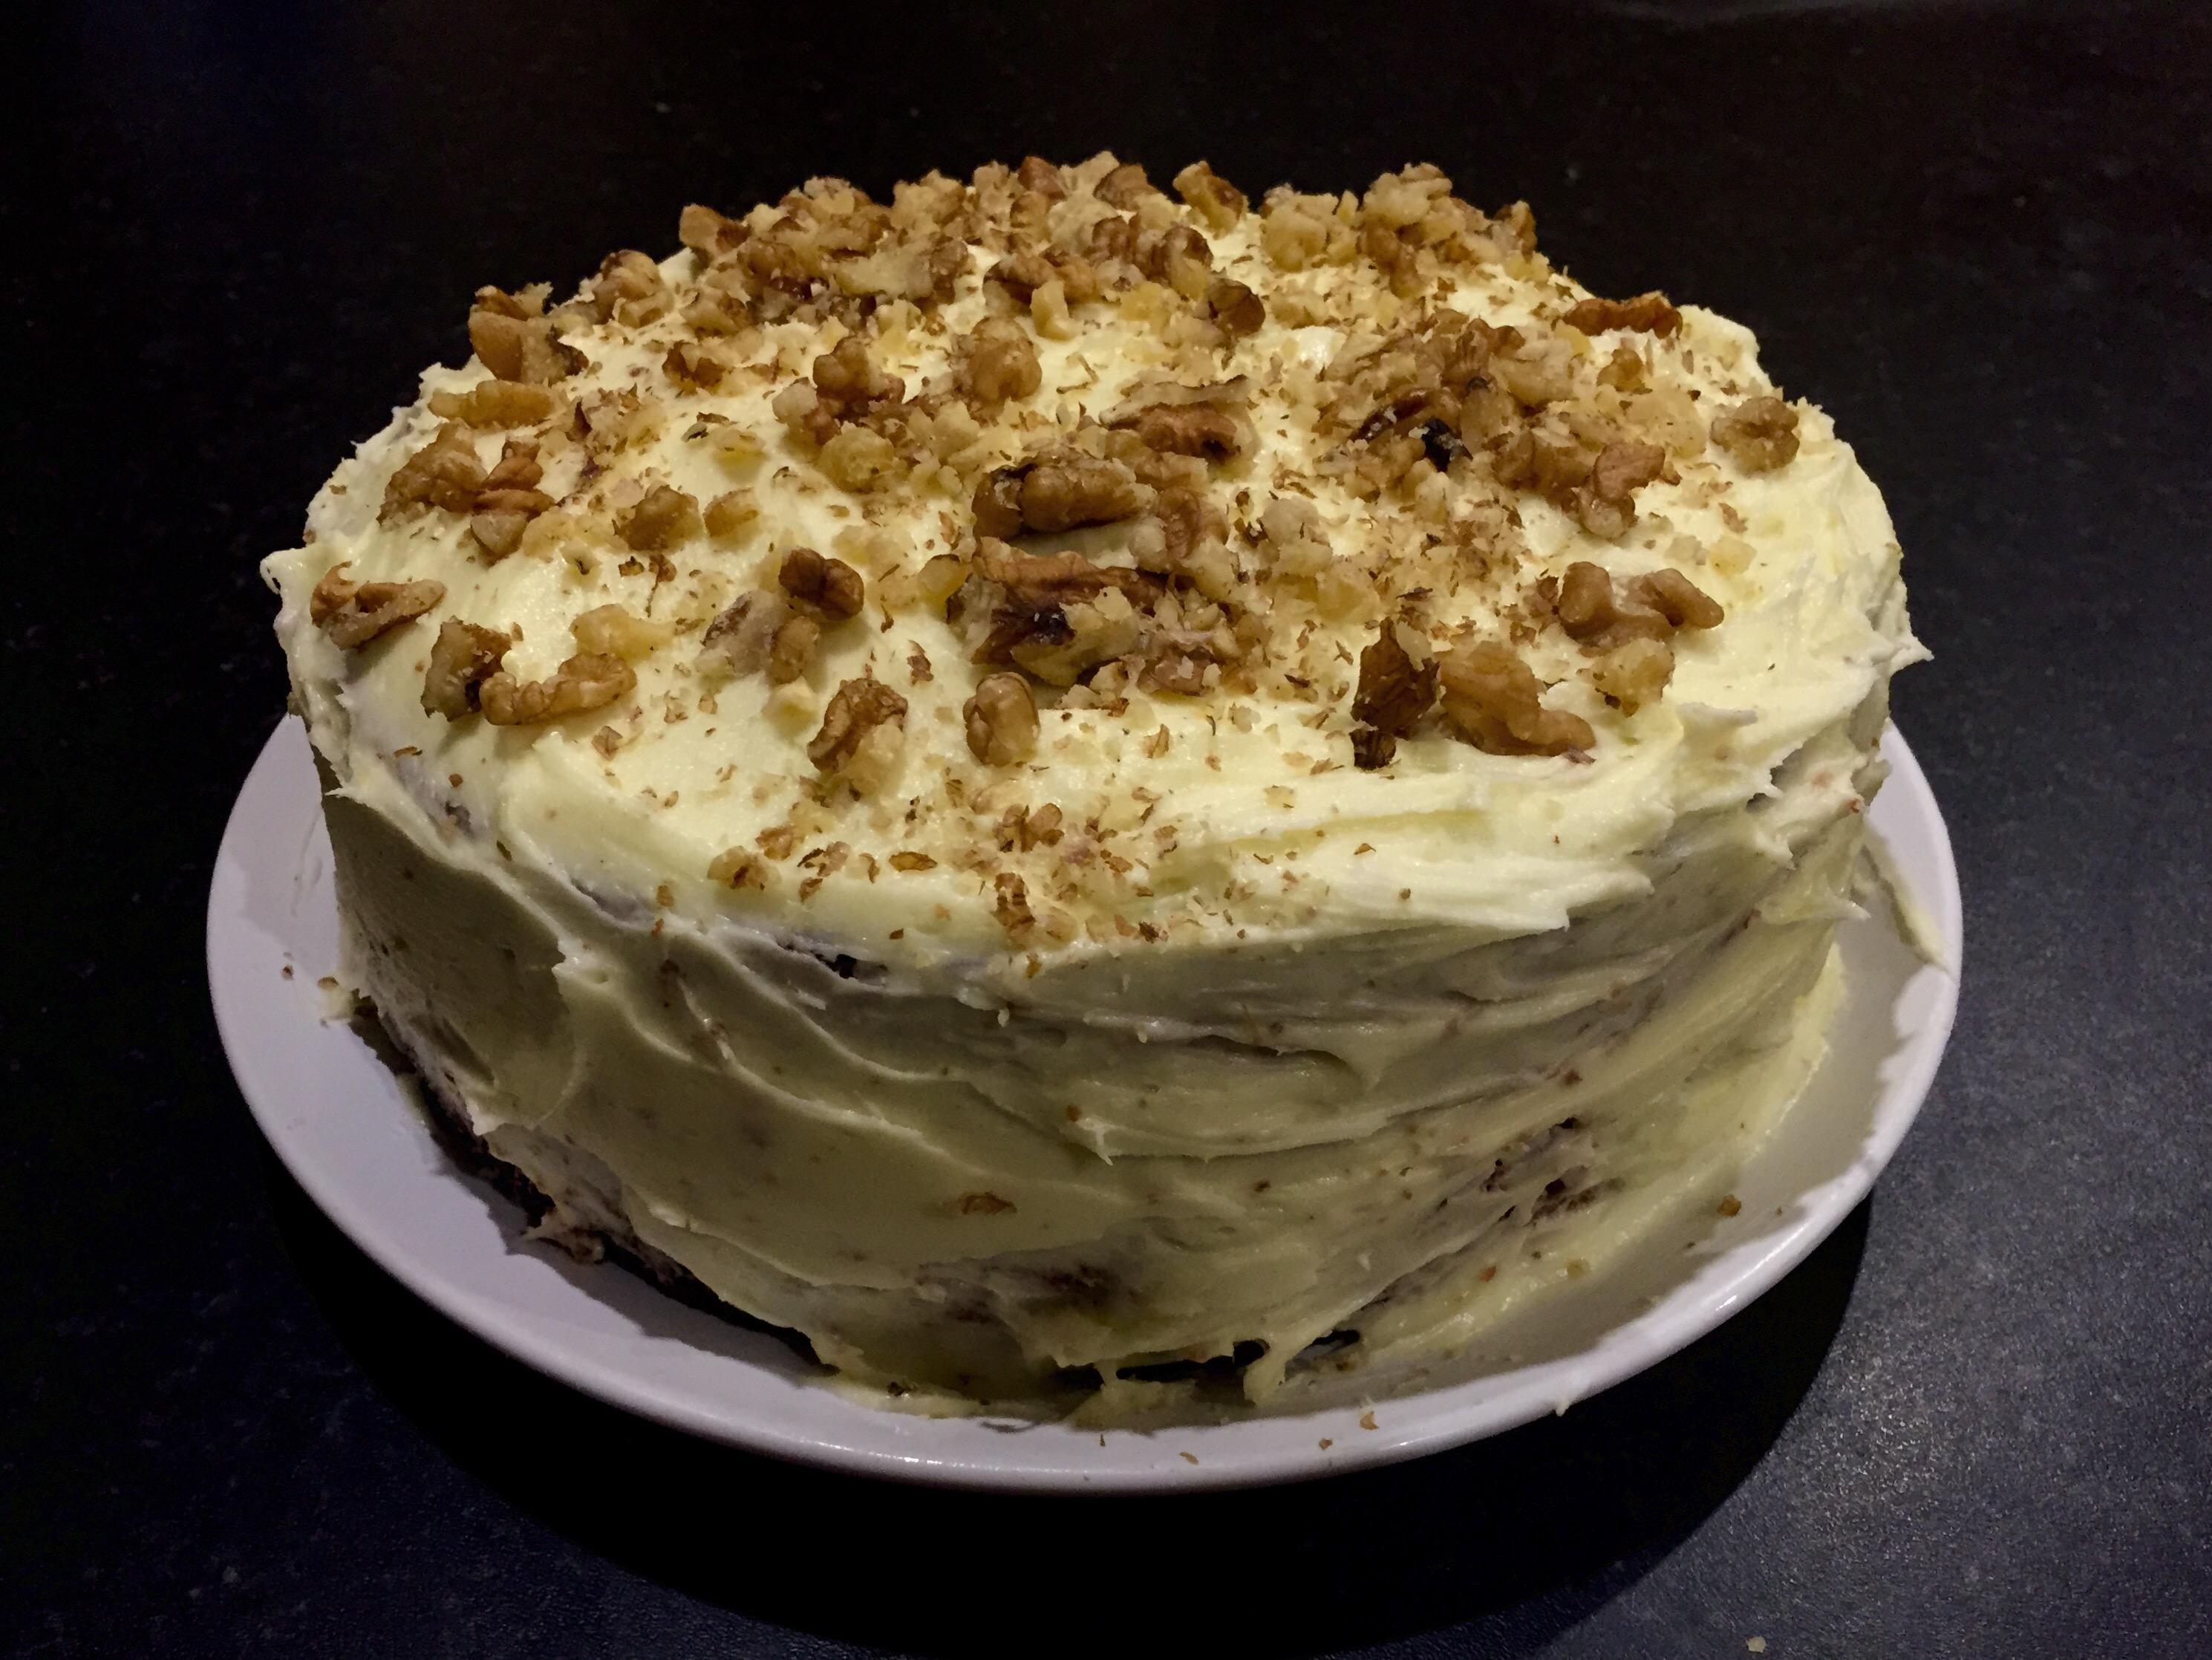 My carrot cake masterpiece